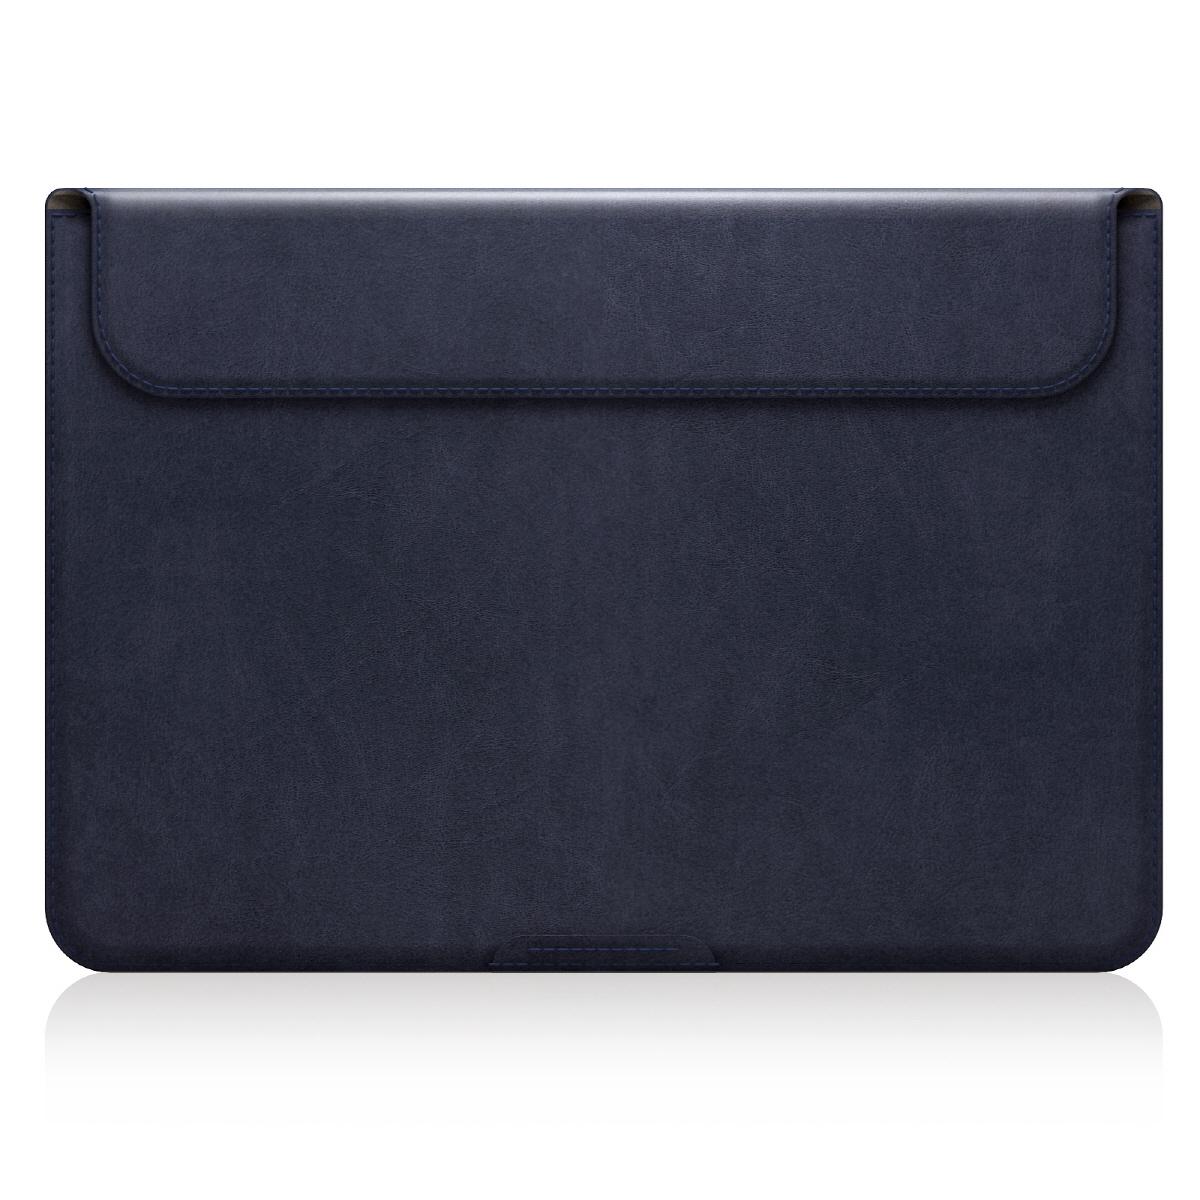 【MacBook 12インチ スタンドケース】 D5 Artificial Leather ネイビー(ディーファイブ アーティフィシャルレザー)